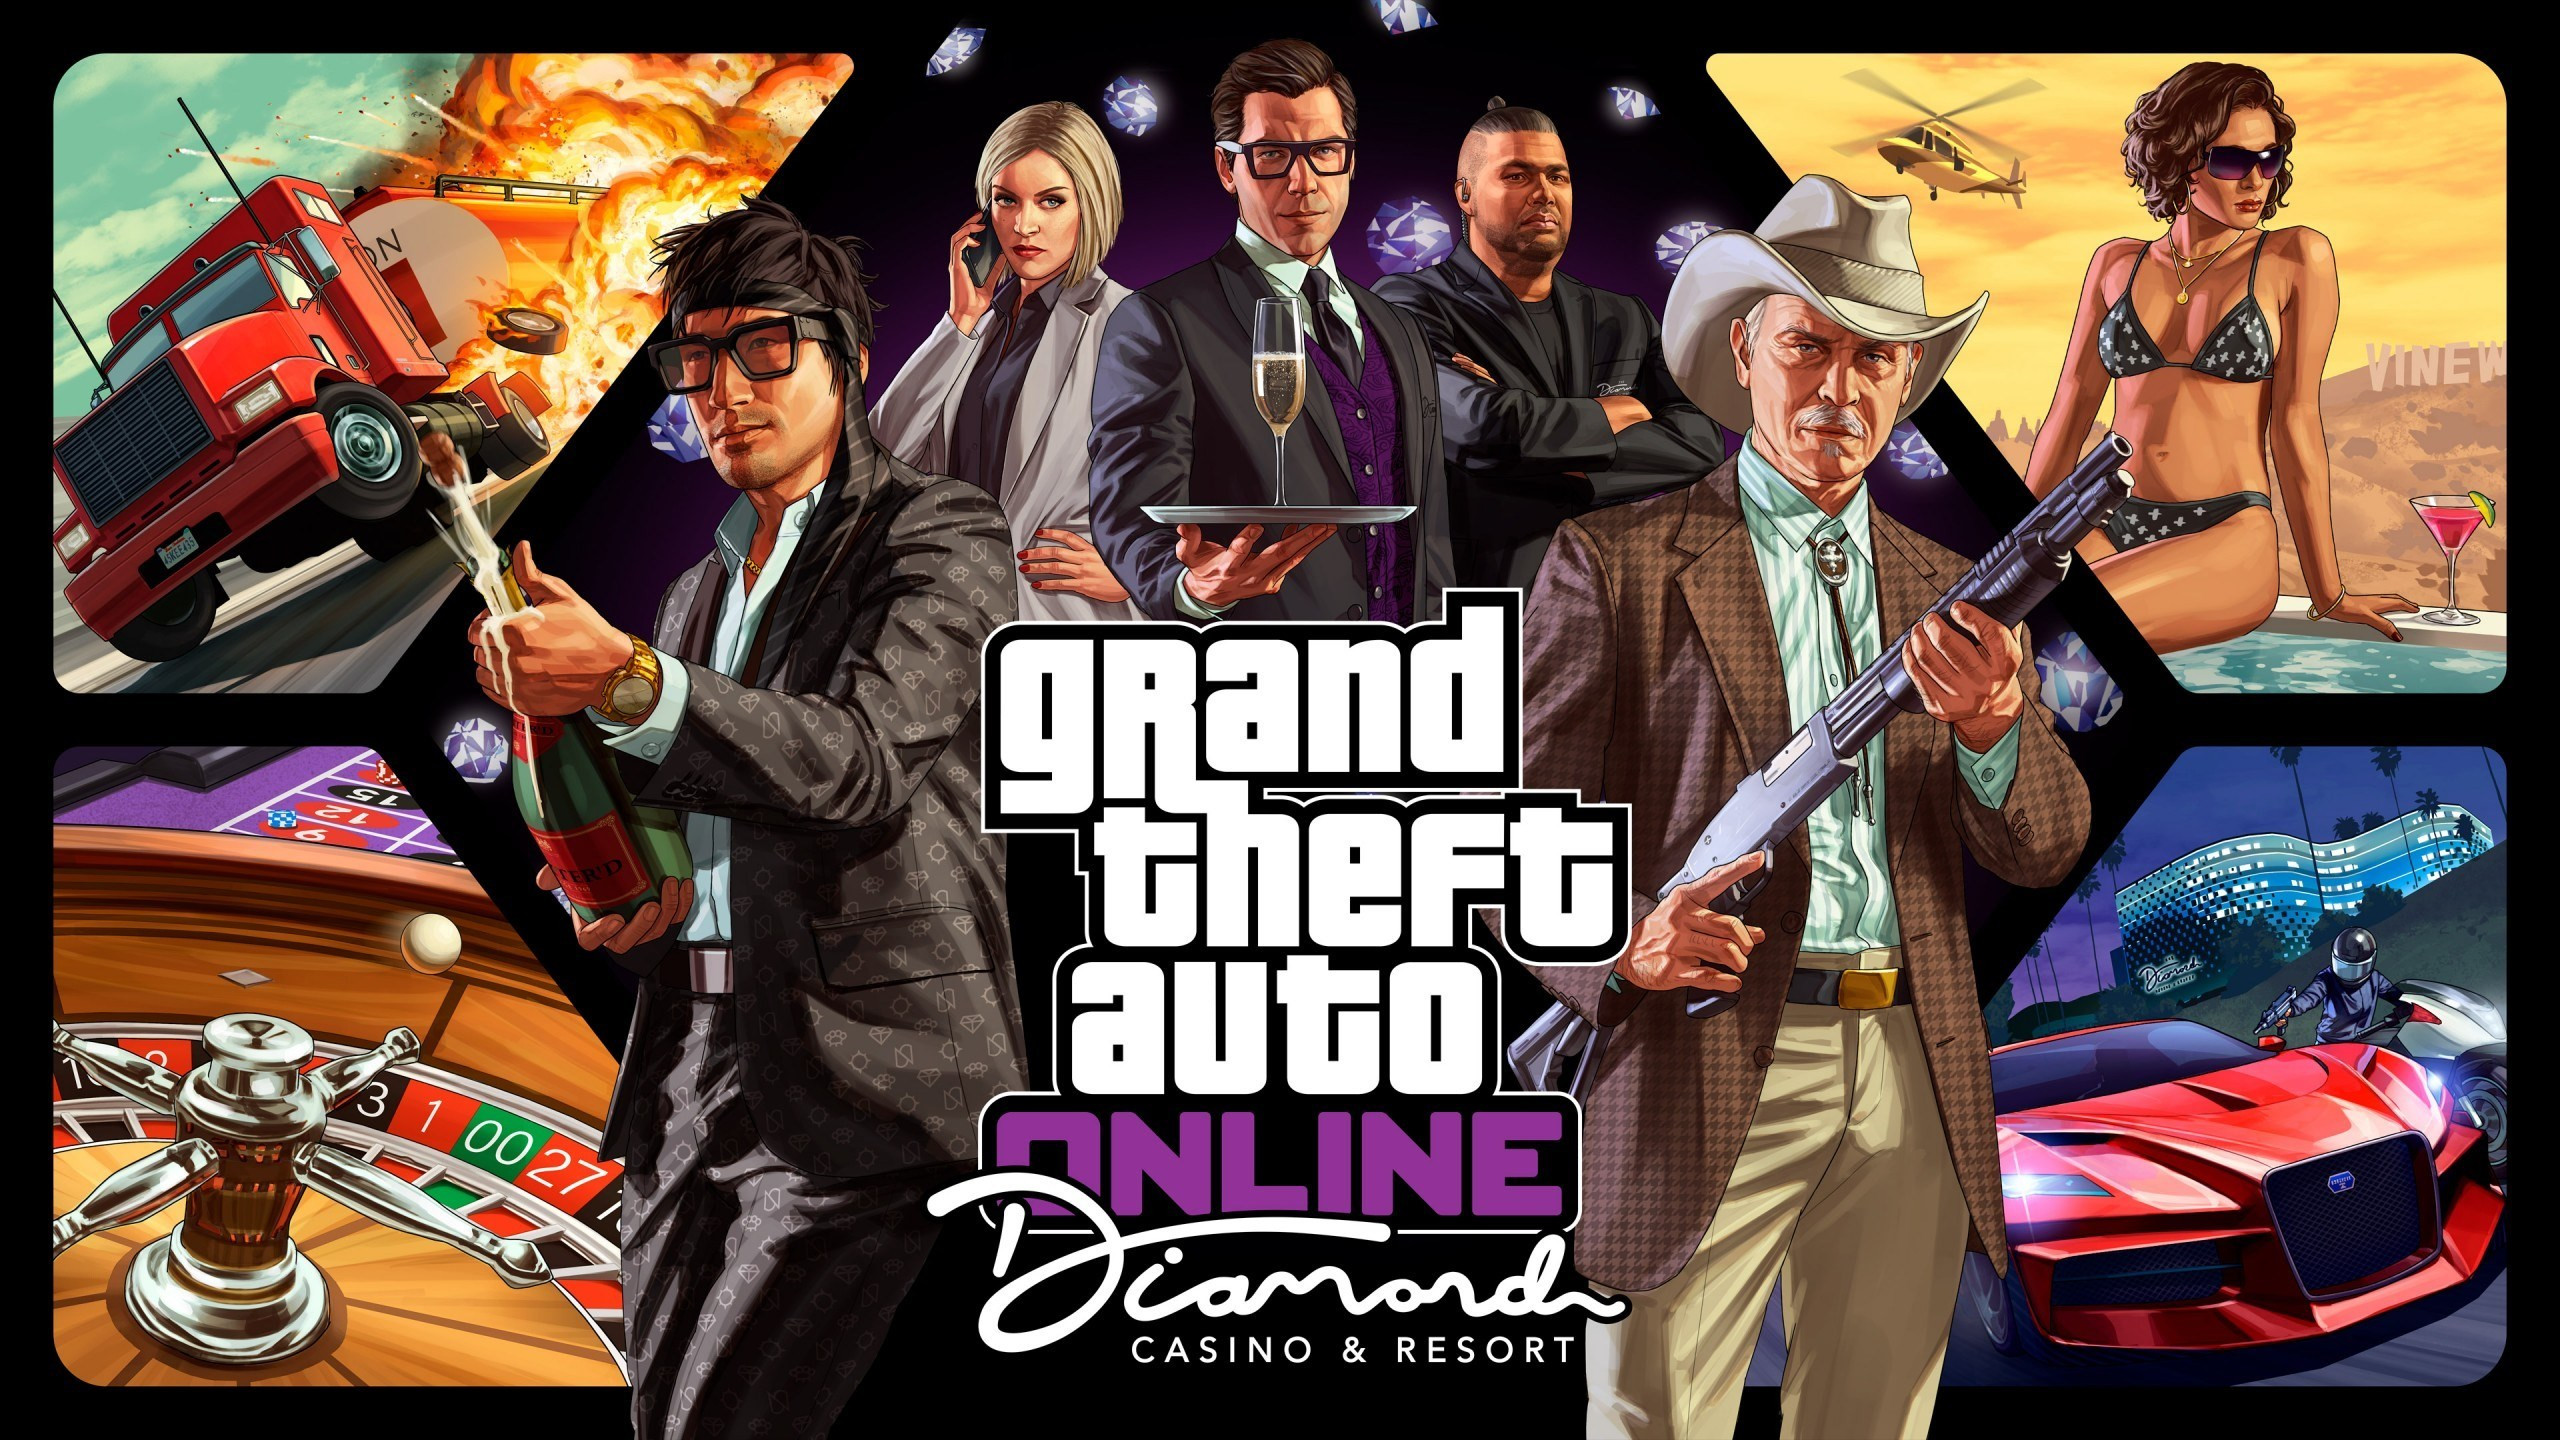 Download Wallpaper Gta Online Diamond Casino Resort 2560x1440